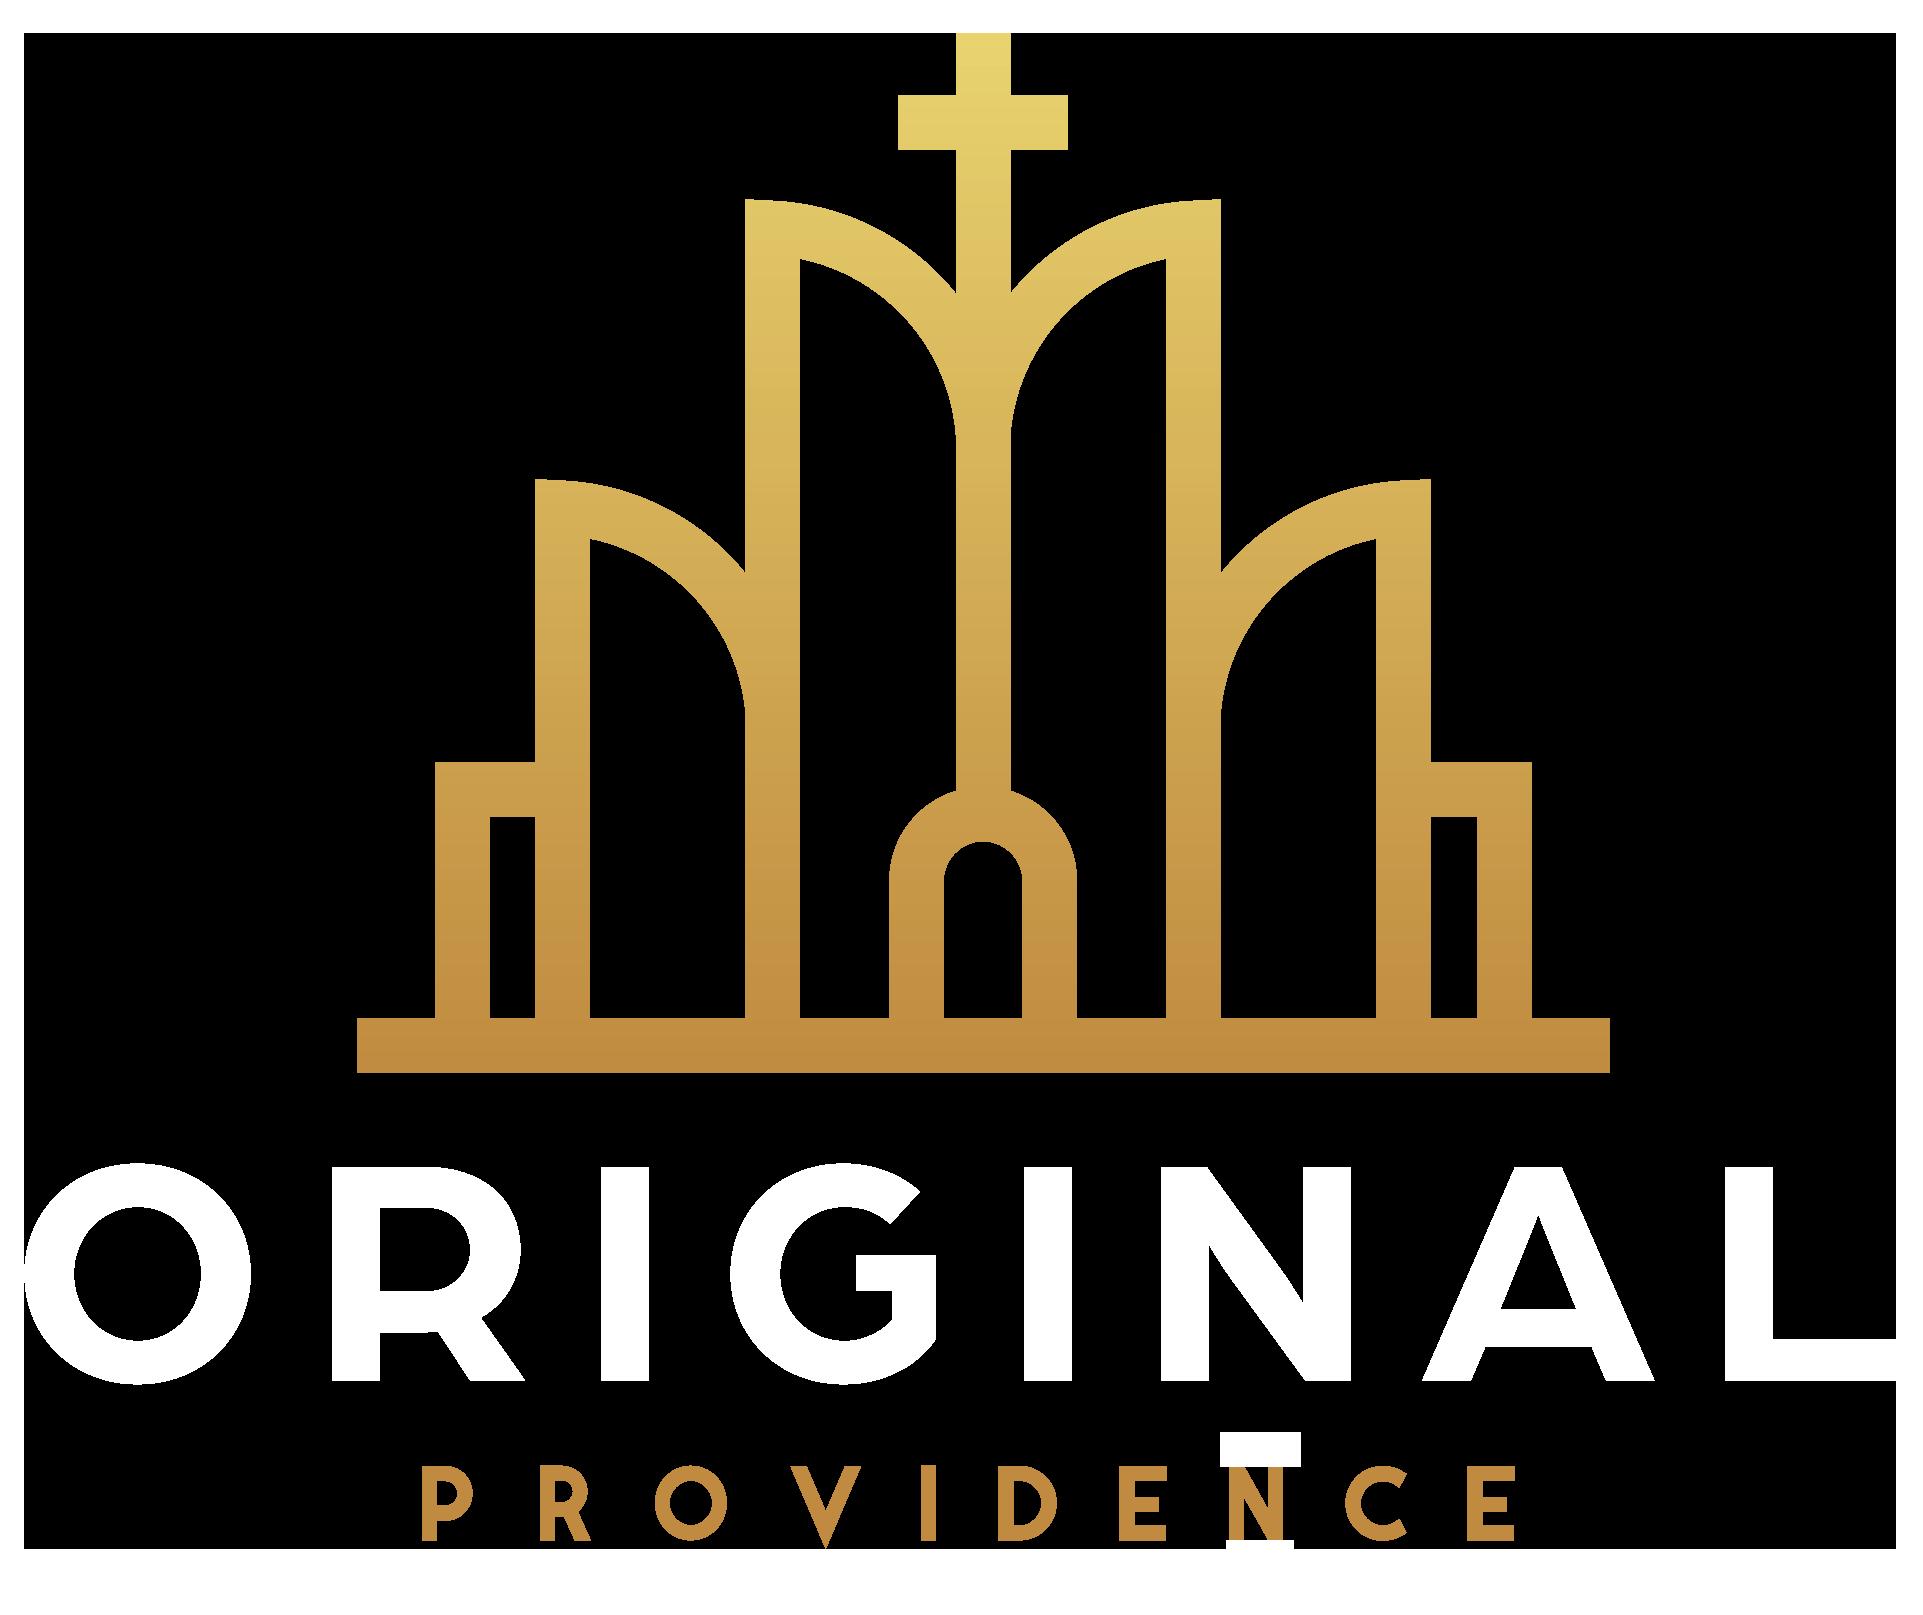 Original Providence Baptist Church.